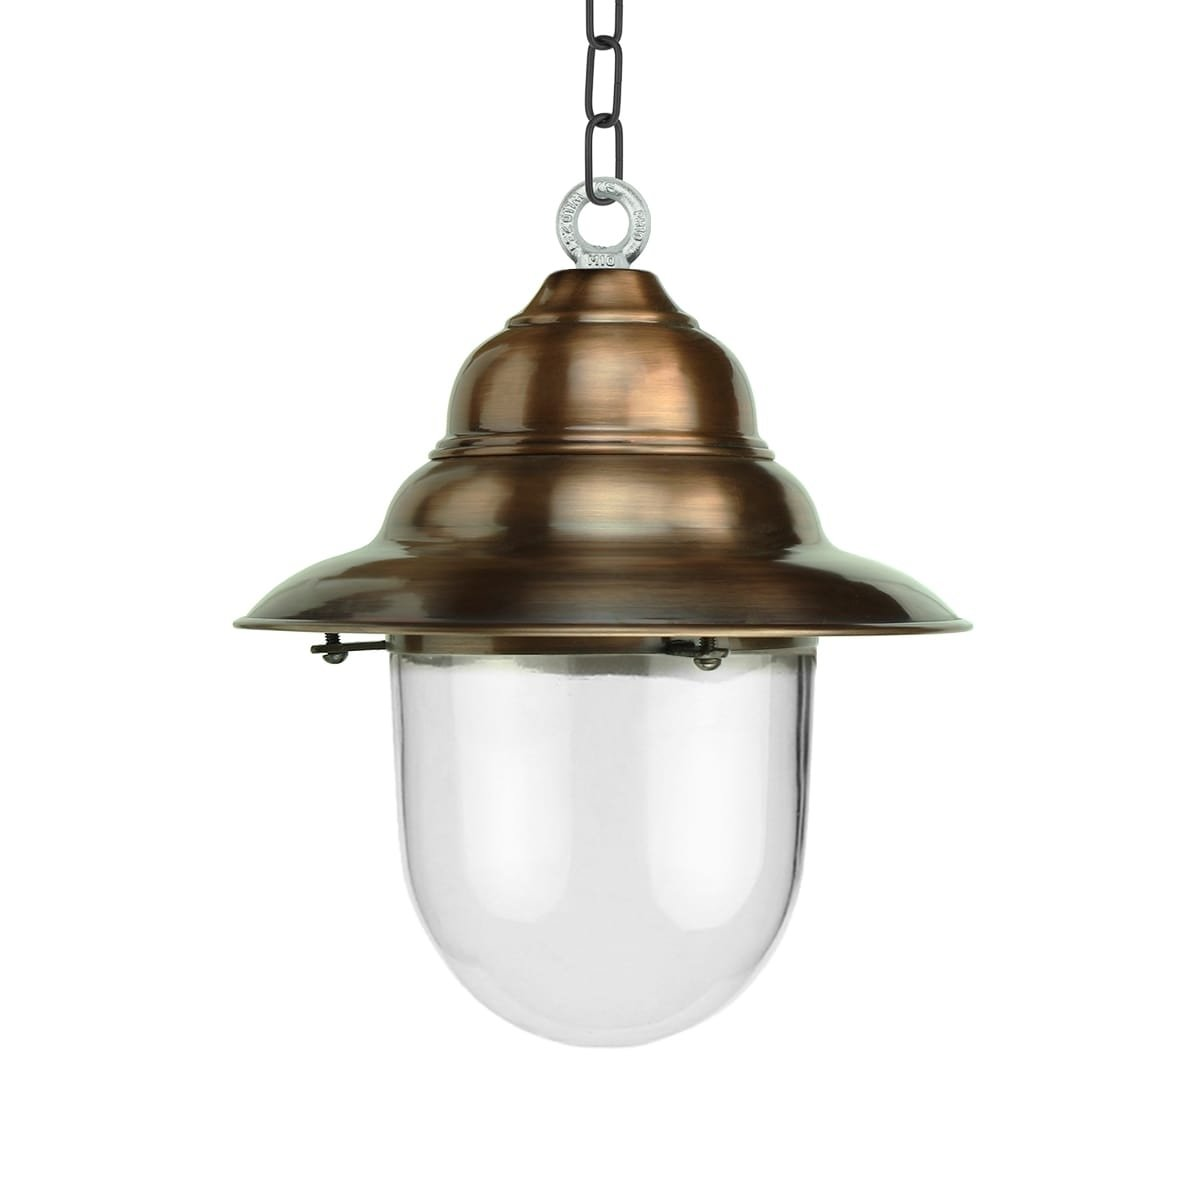 Outdoor Lighting Classic Rural Porch lamp rustic Archem copper - 35 cm